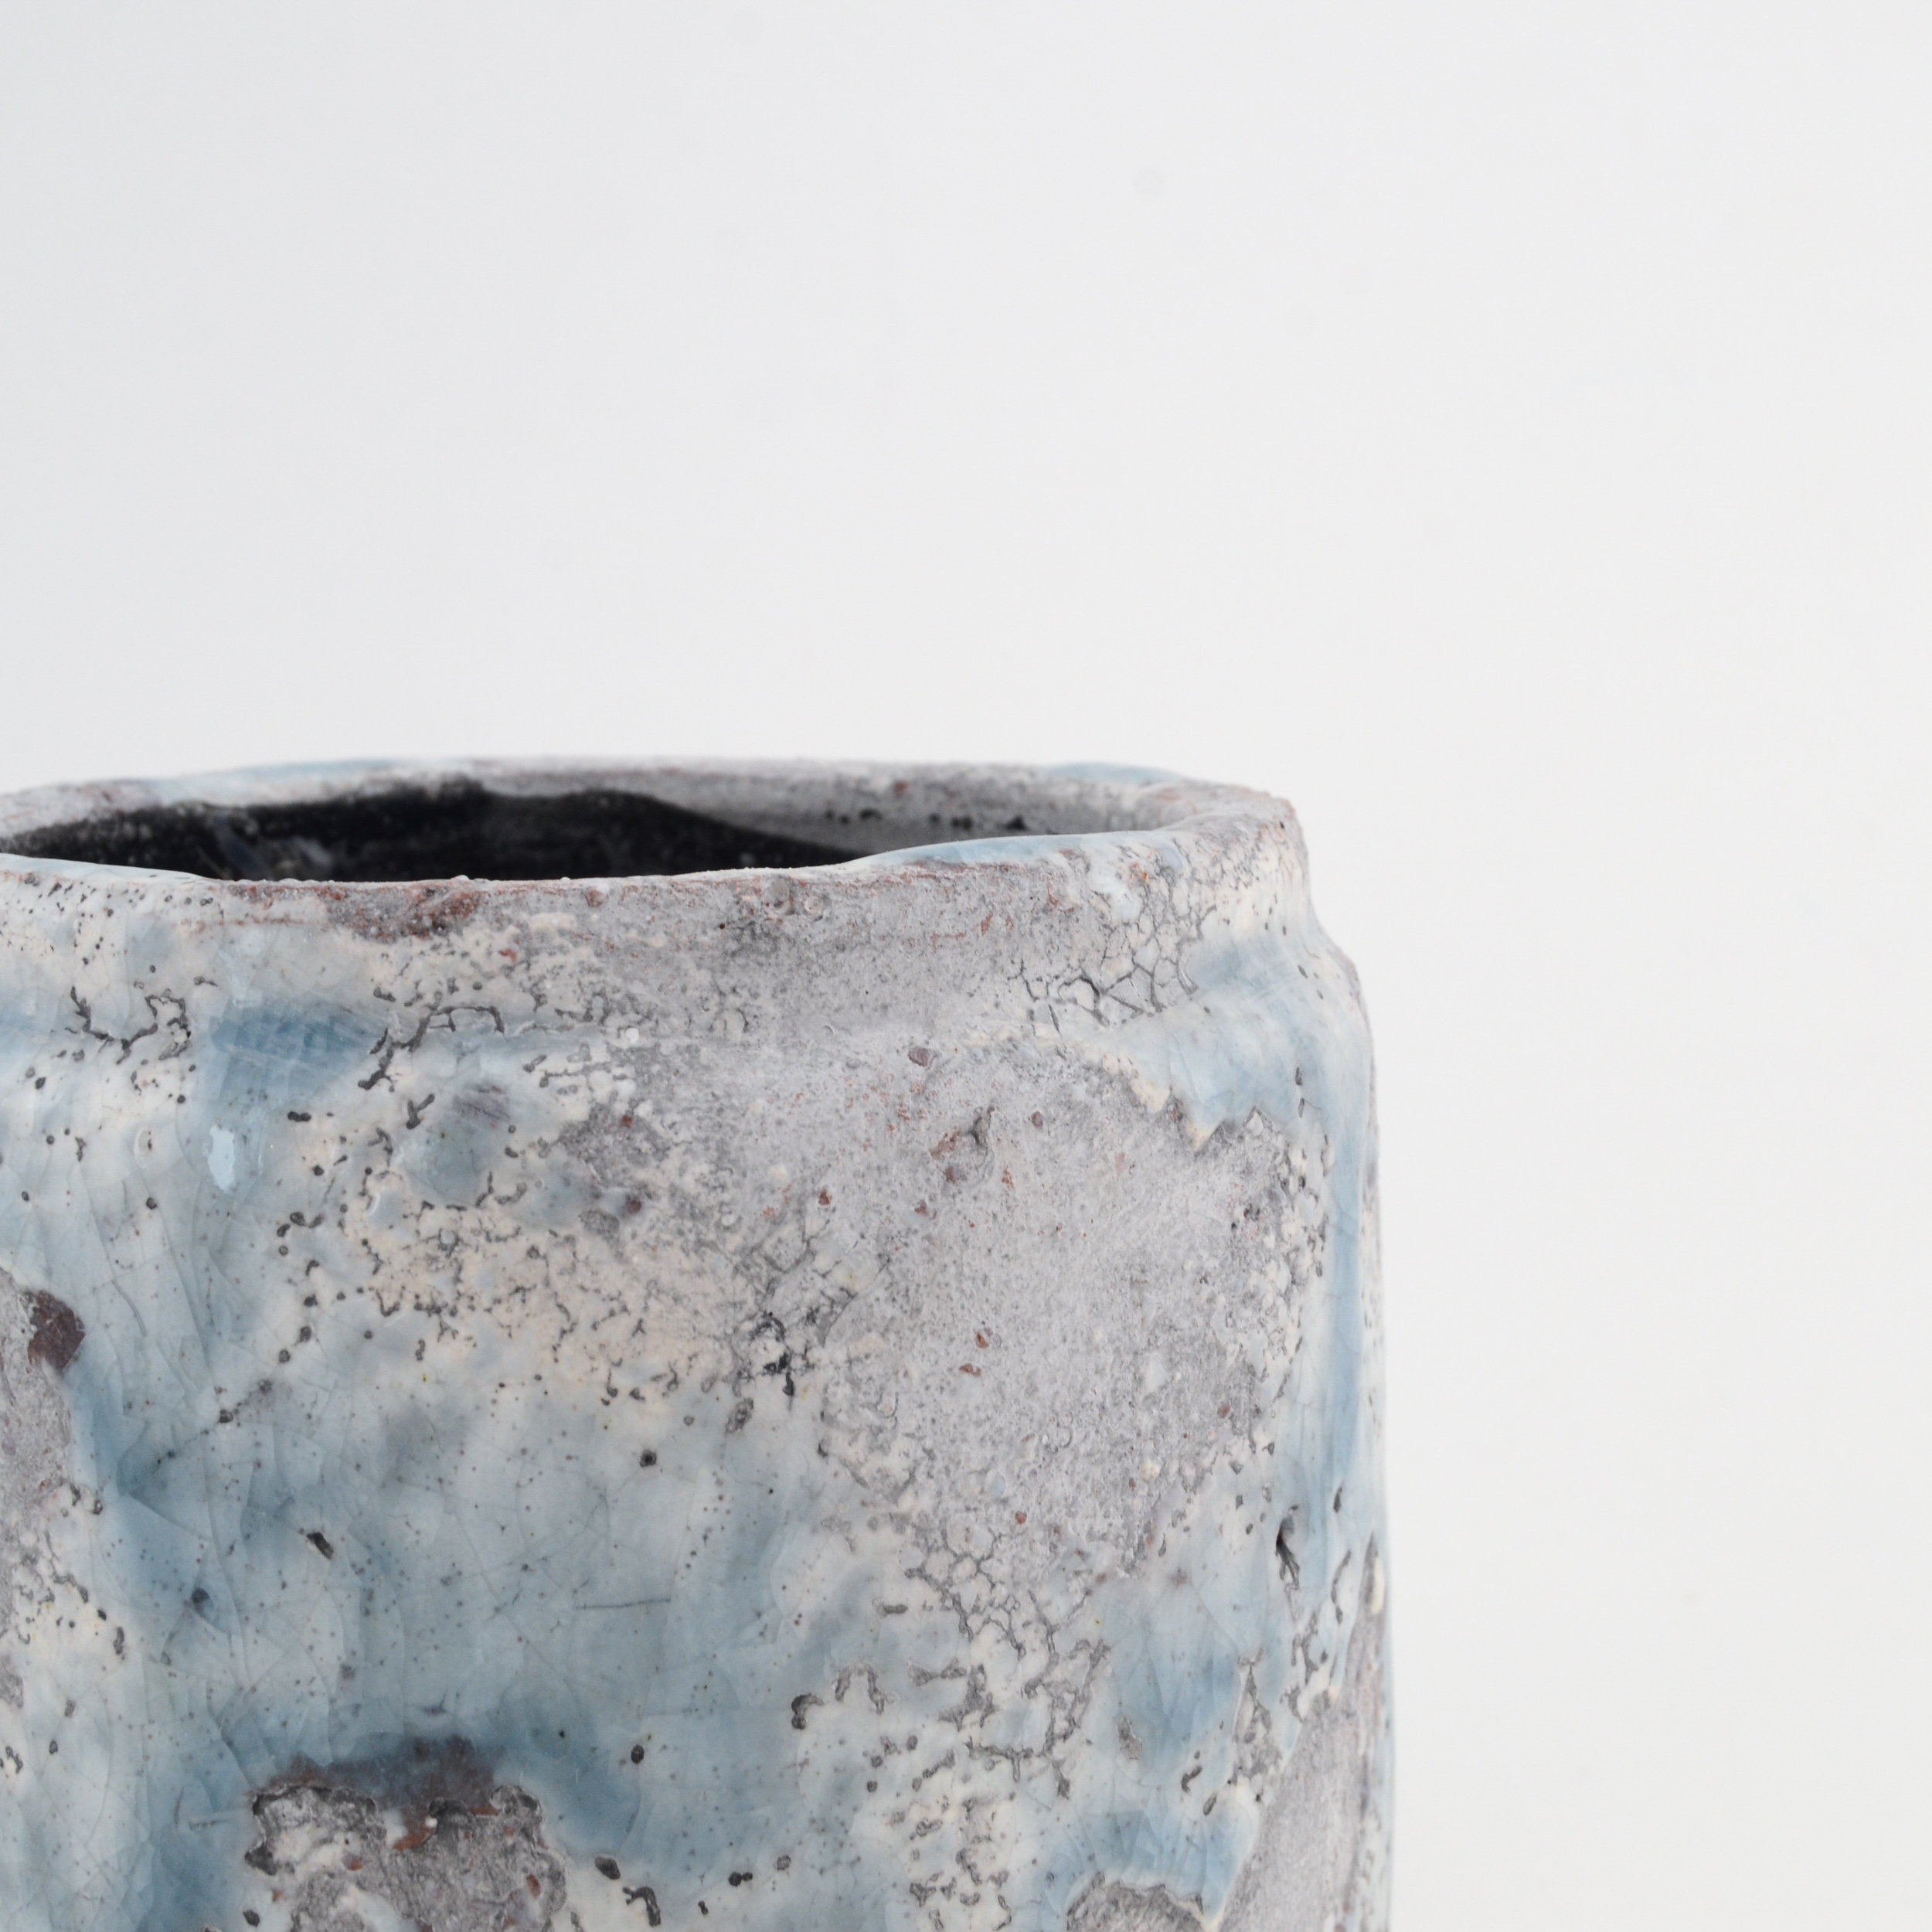 Small Glazed Ceramic Pot